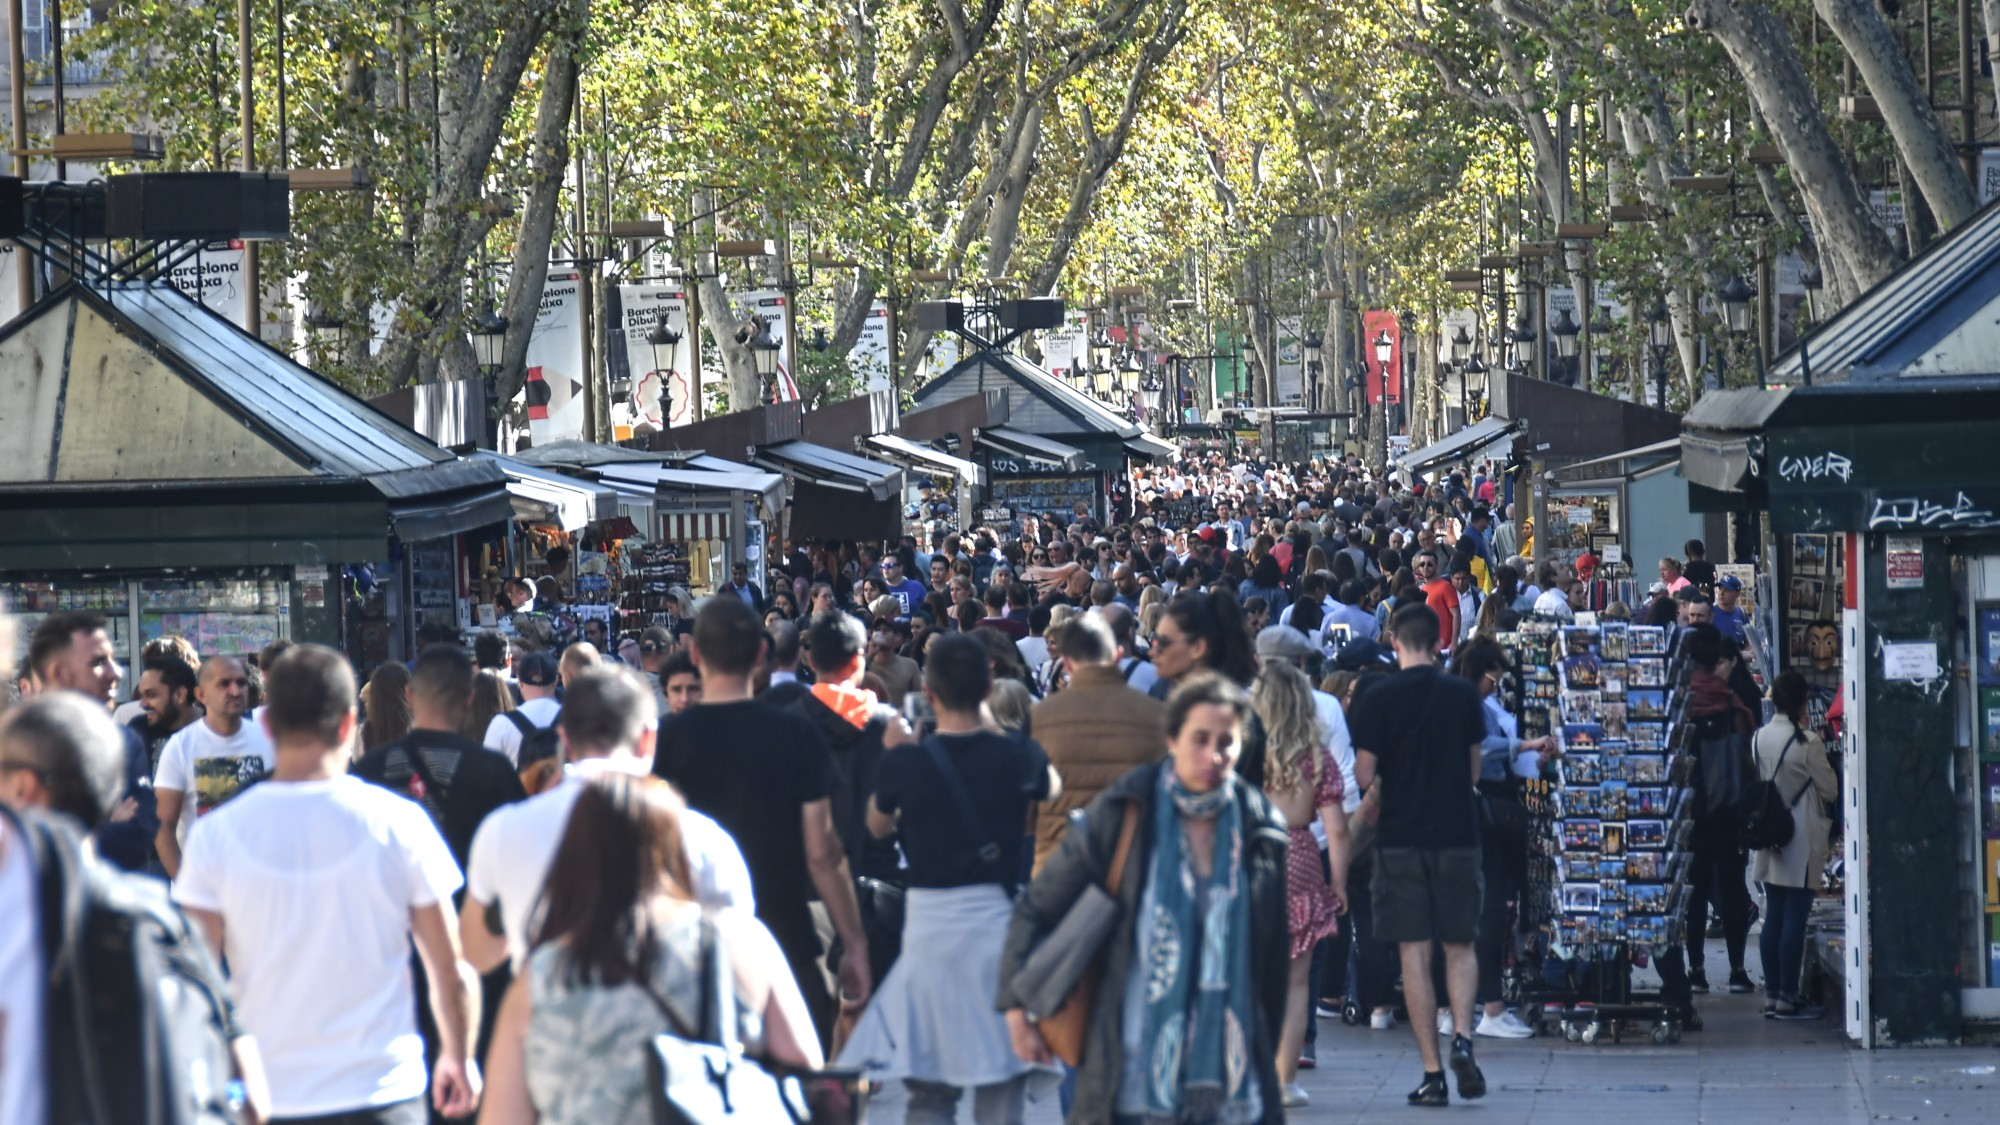 Artikel 'Toerisme: balans tussen goed en kwaad'